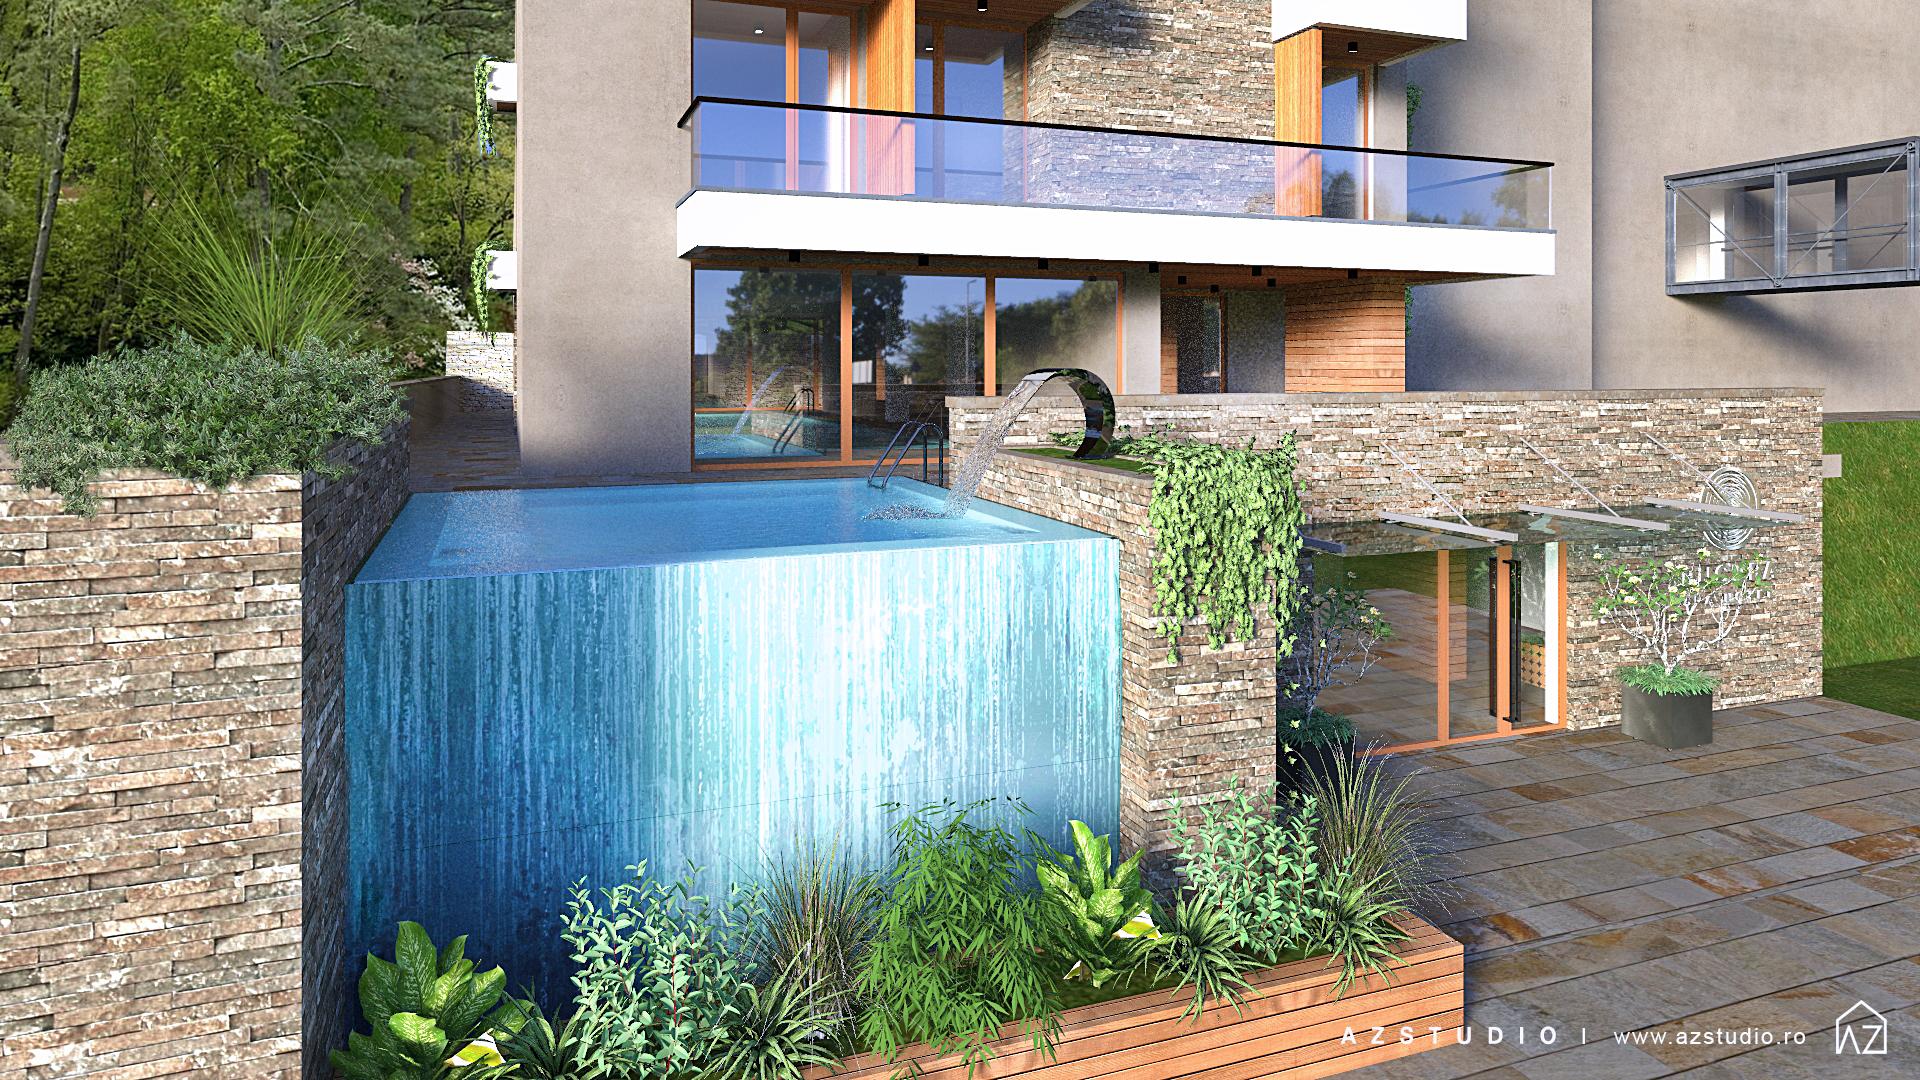 Proiect hotel cu SPA termal in Calimanesti, Valcea